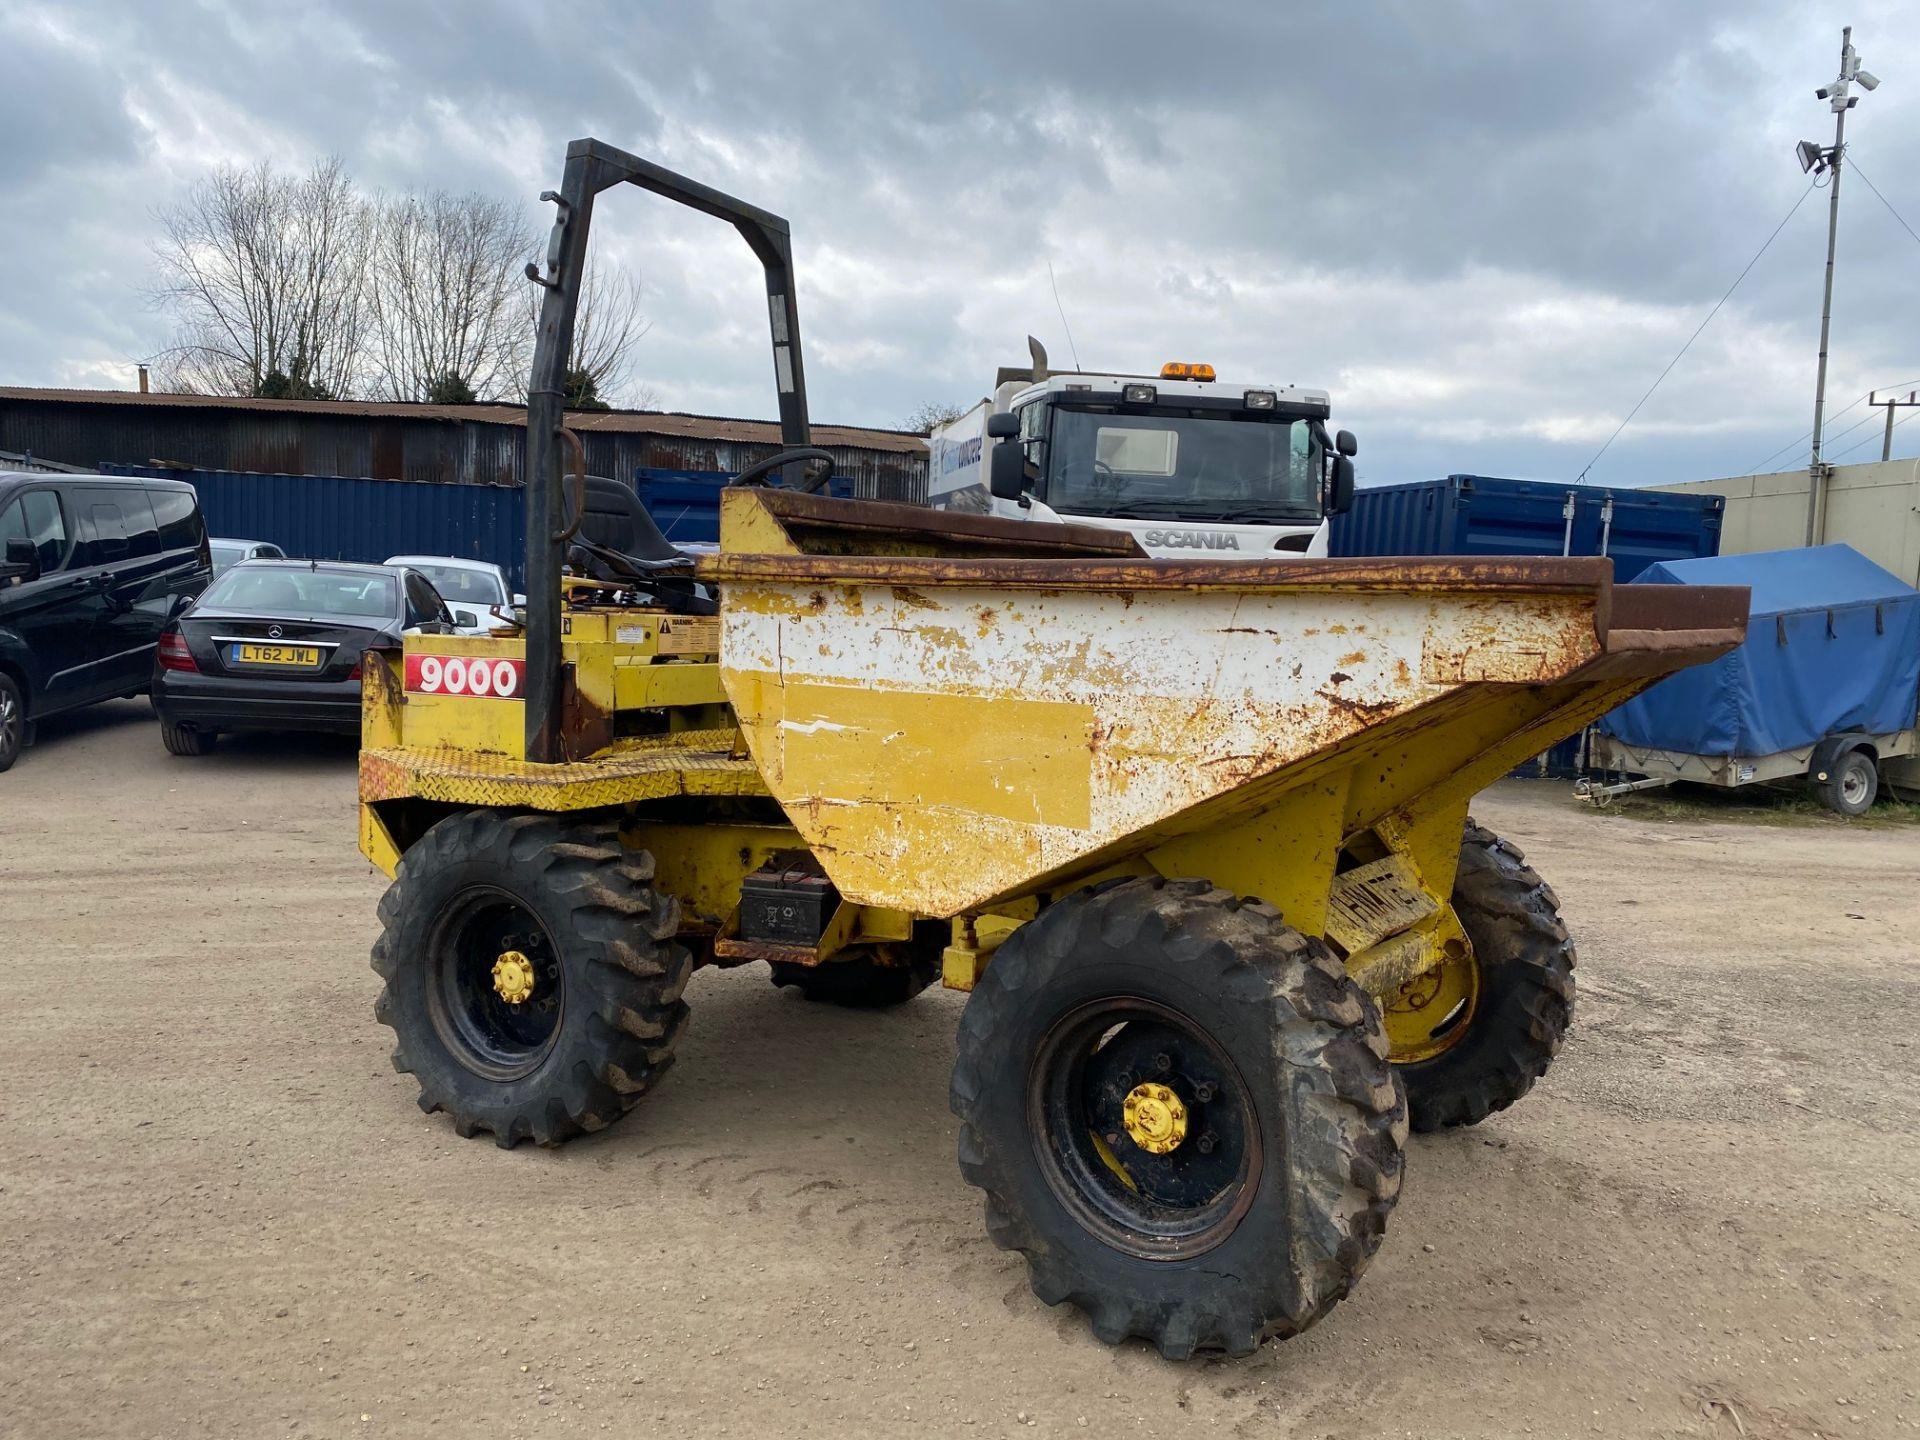 Thwaites 4 ton dumper, 4x4, electric start, Roll bar, 3 cylinder Lister Petter engine